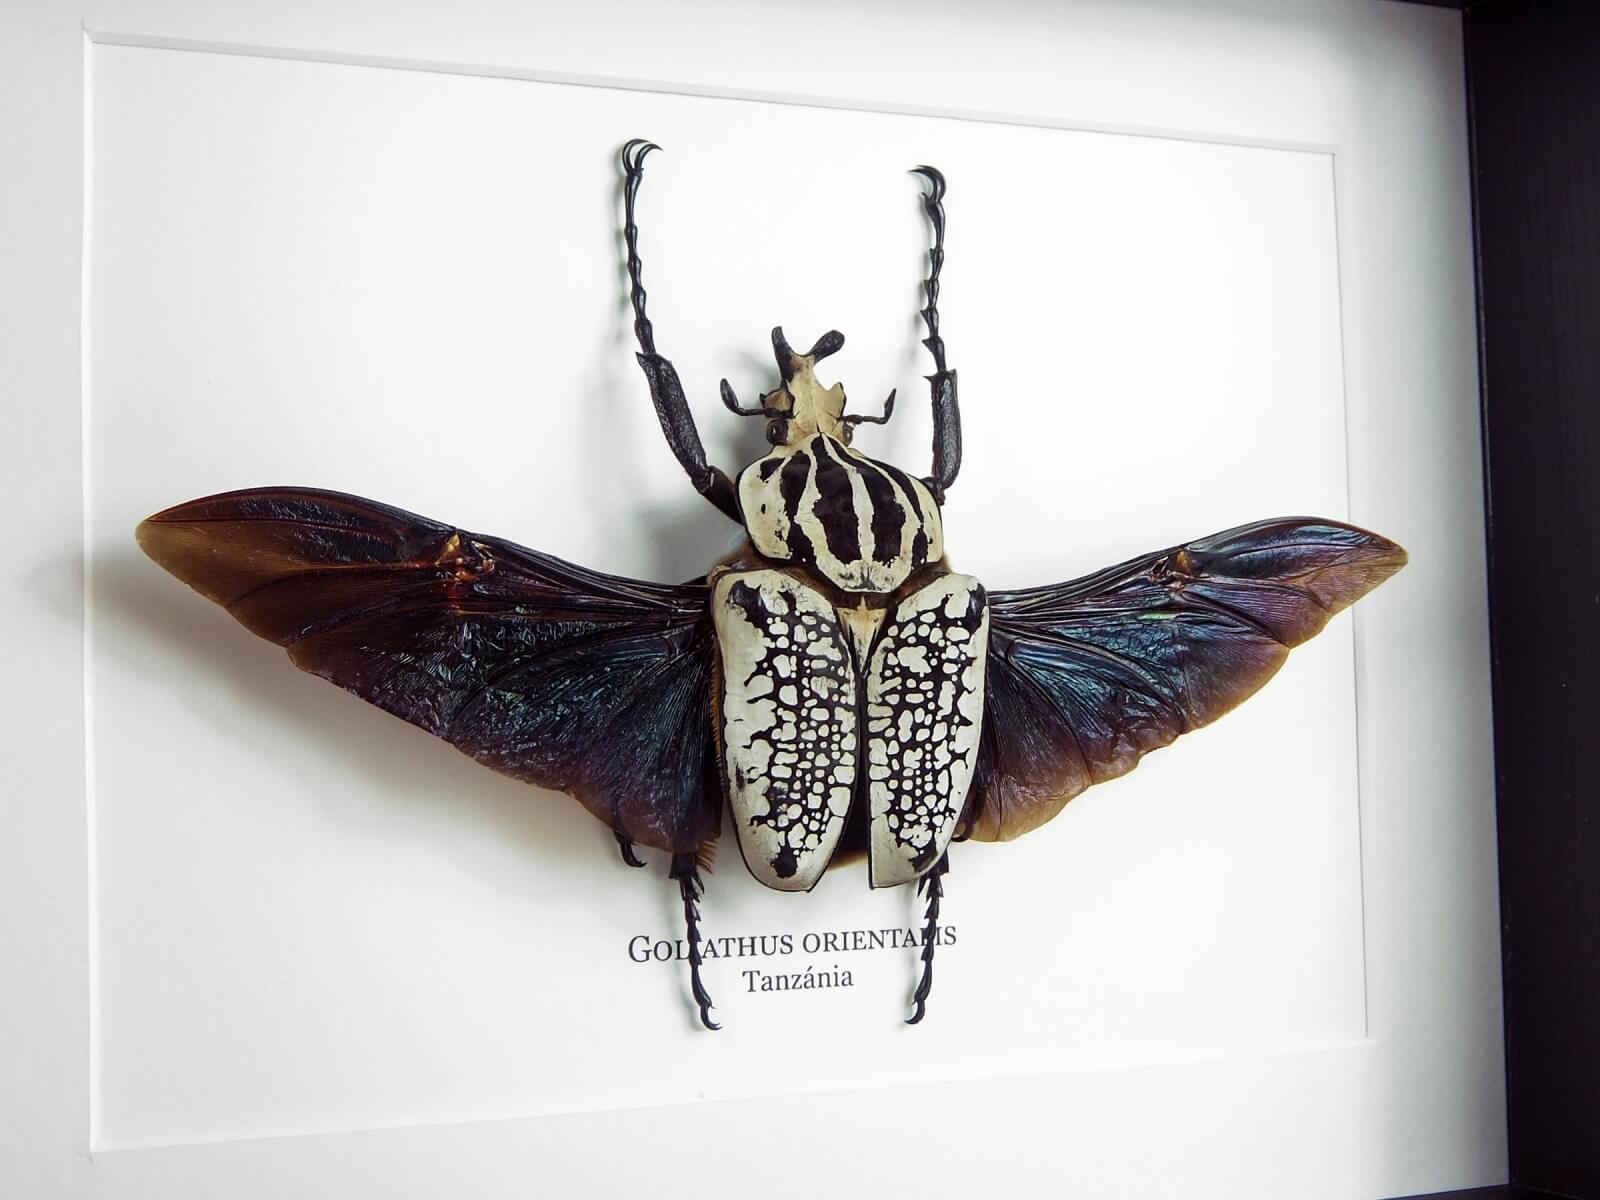 Goliathus orientalis, fekete keretben | #2208